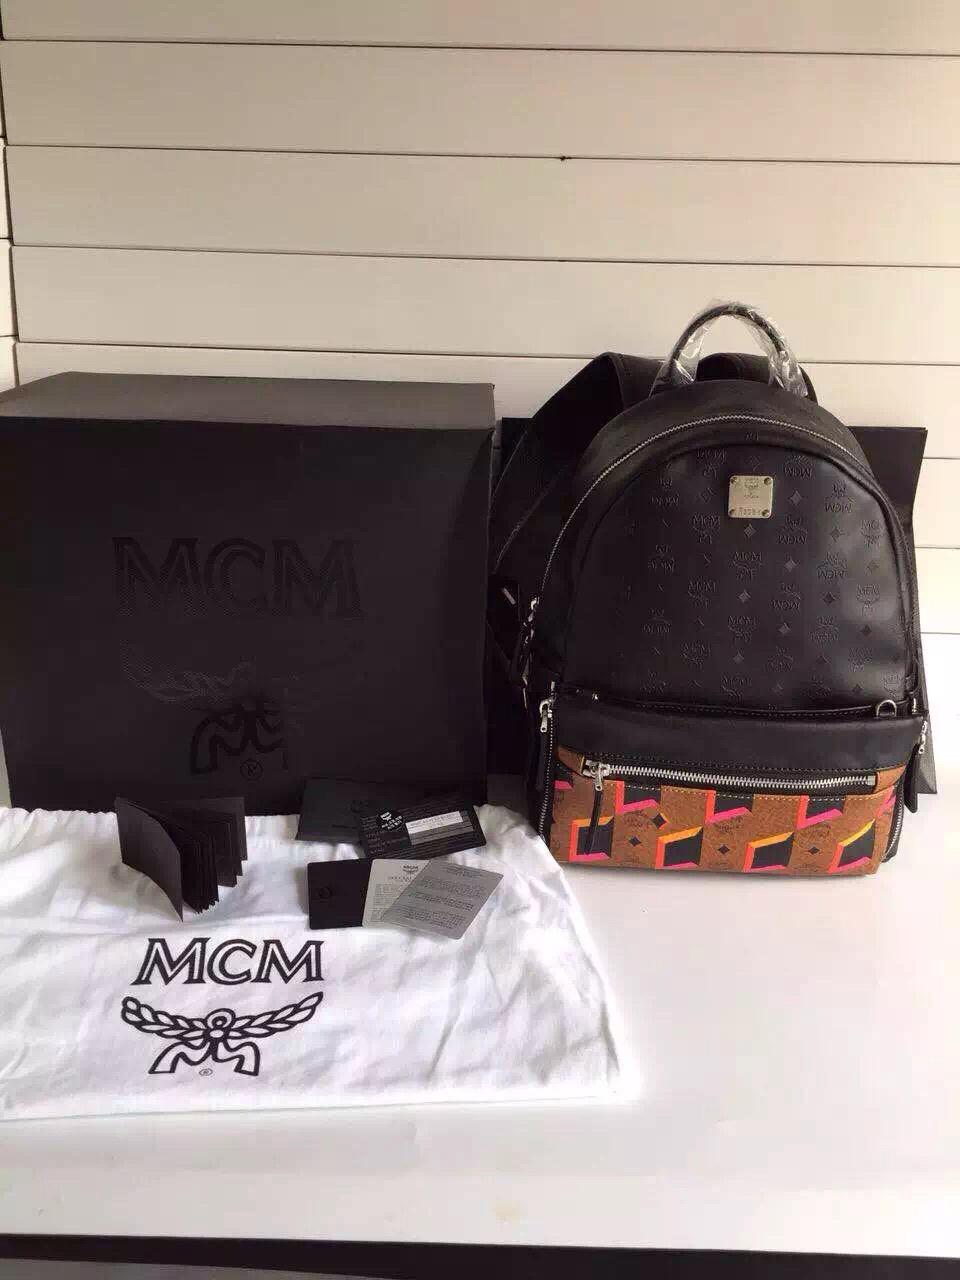 MCM原单 李易峰同款 独立编码 全套包装 黑色